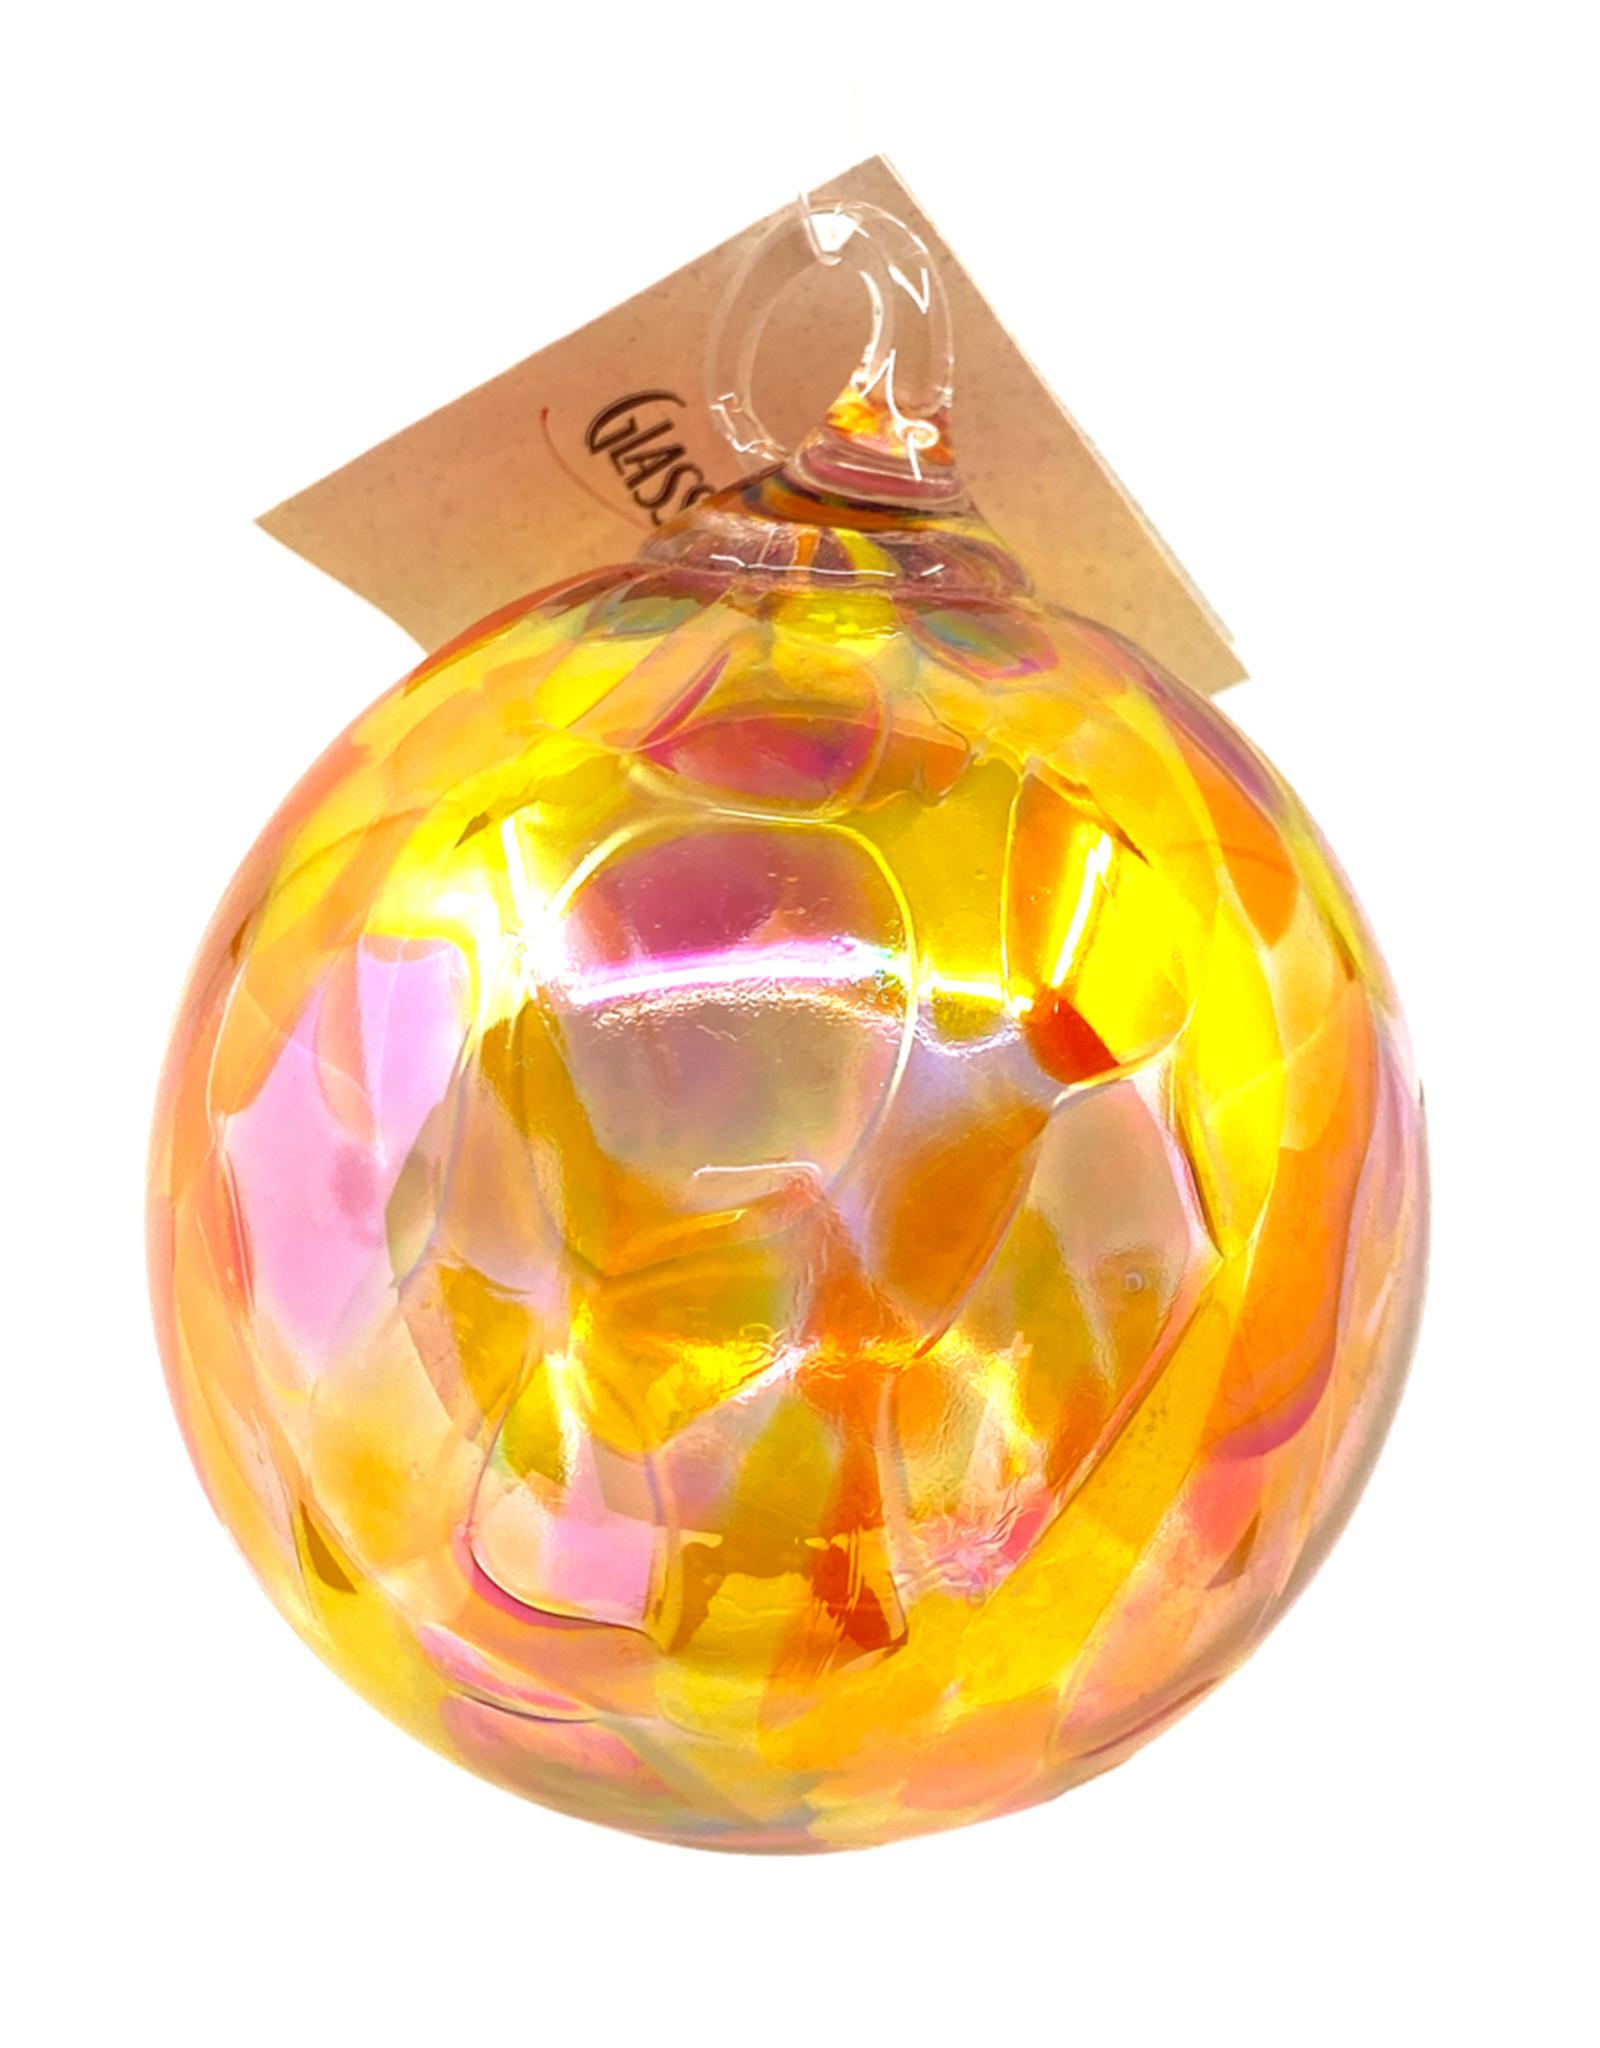 GLASS EYE SUNSET BEAUTY ORCHID ORNAMENT